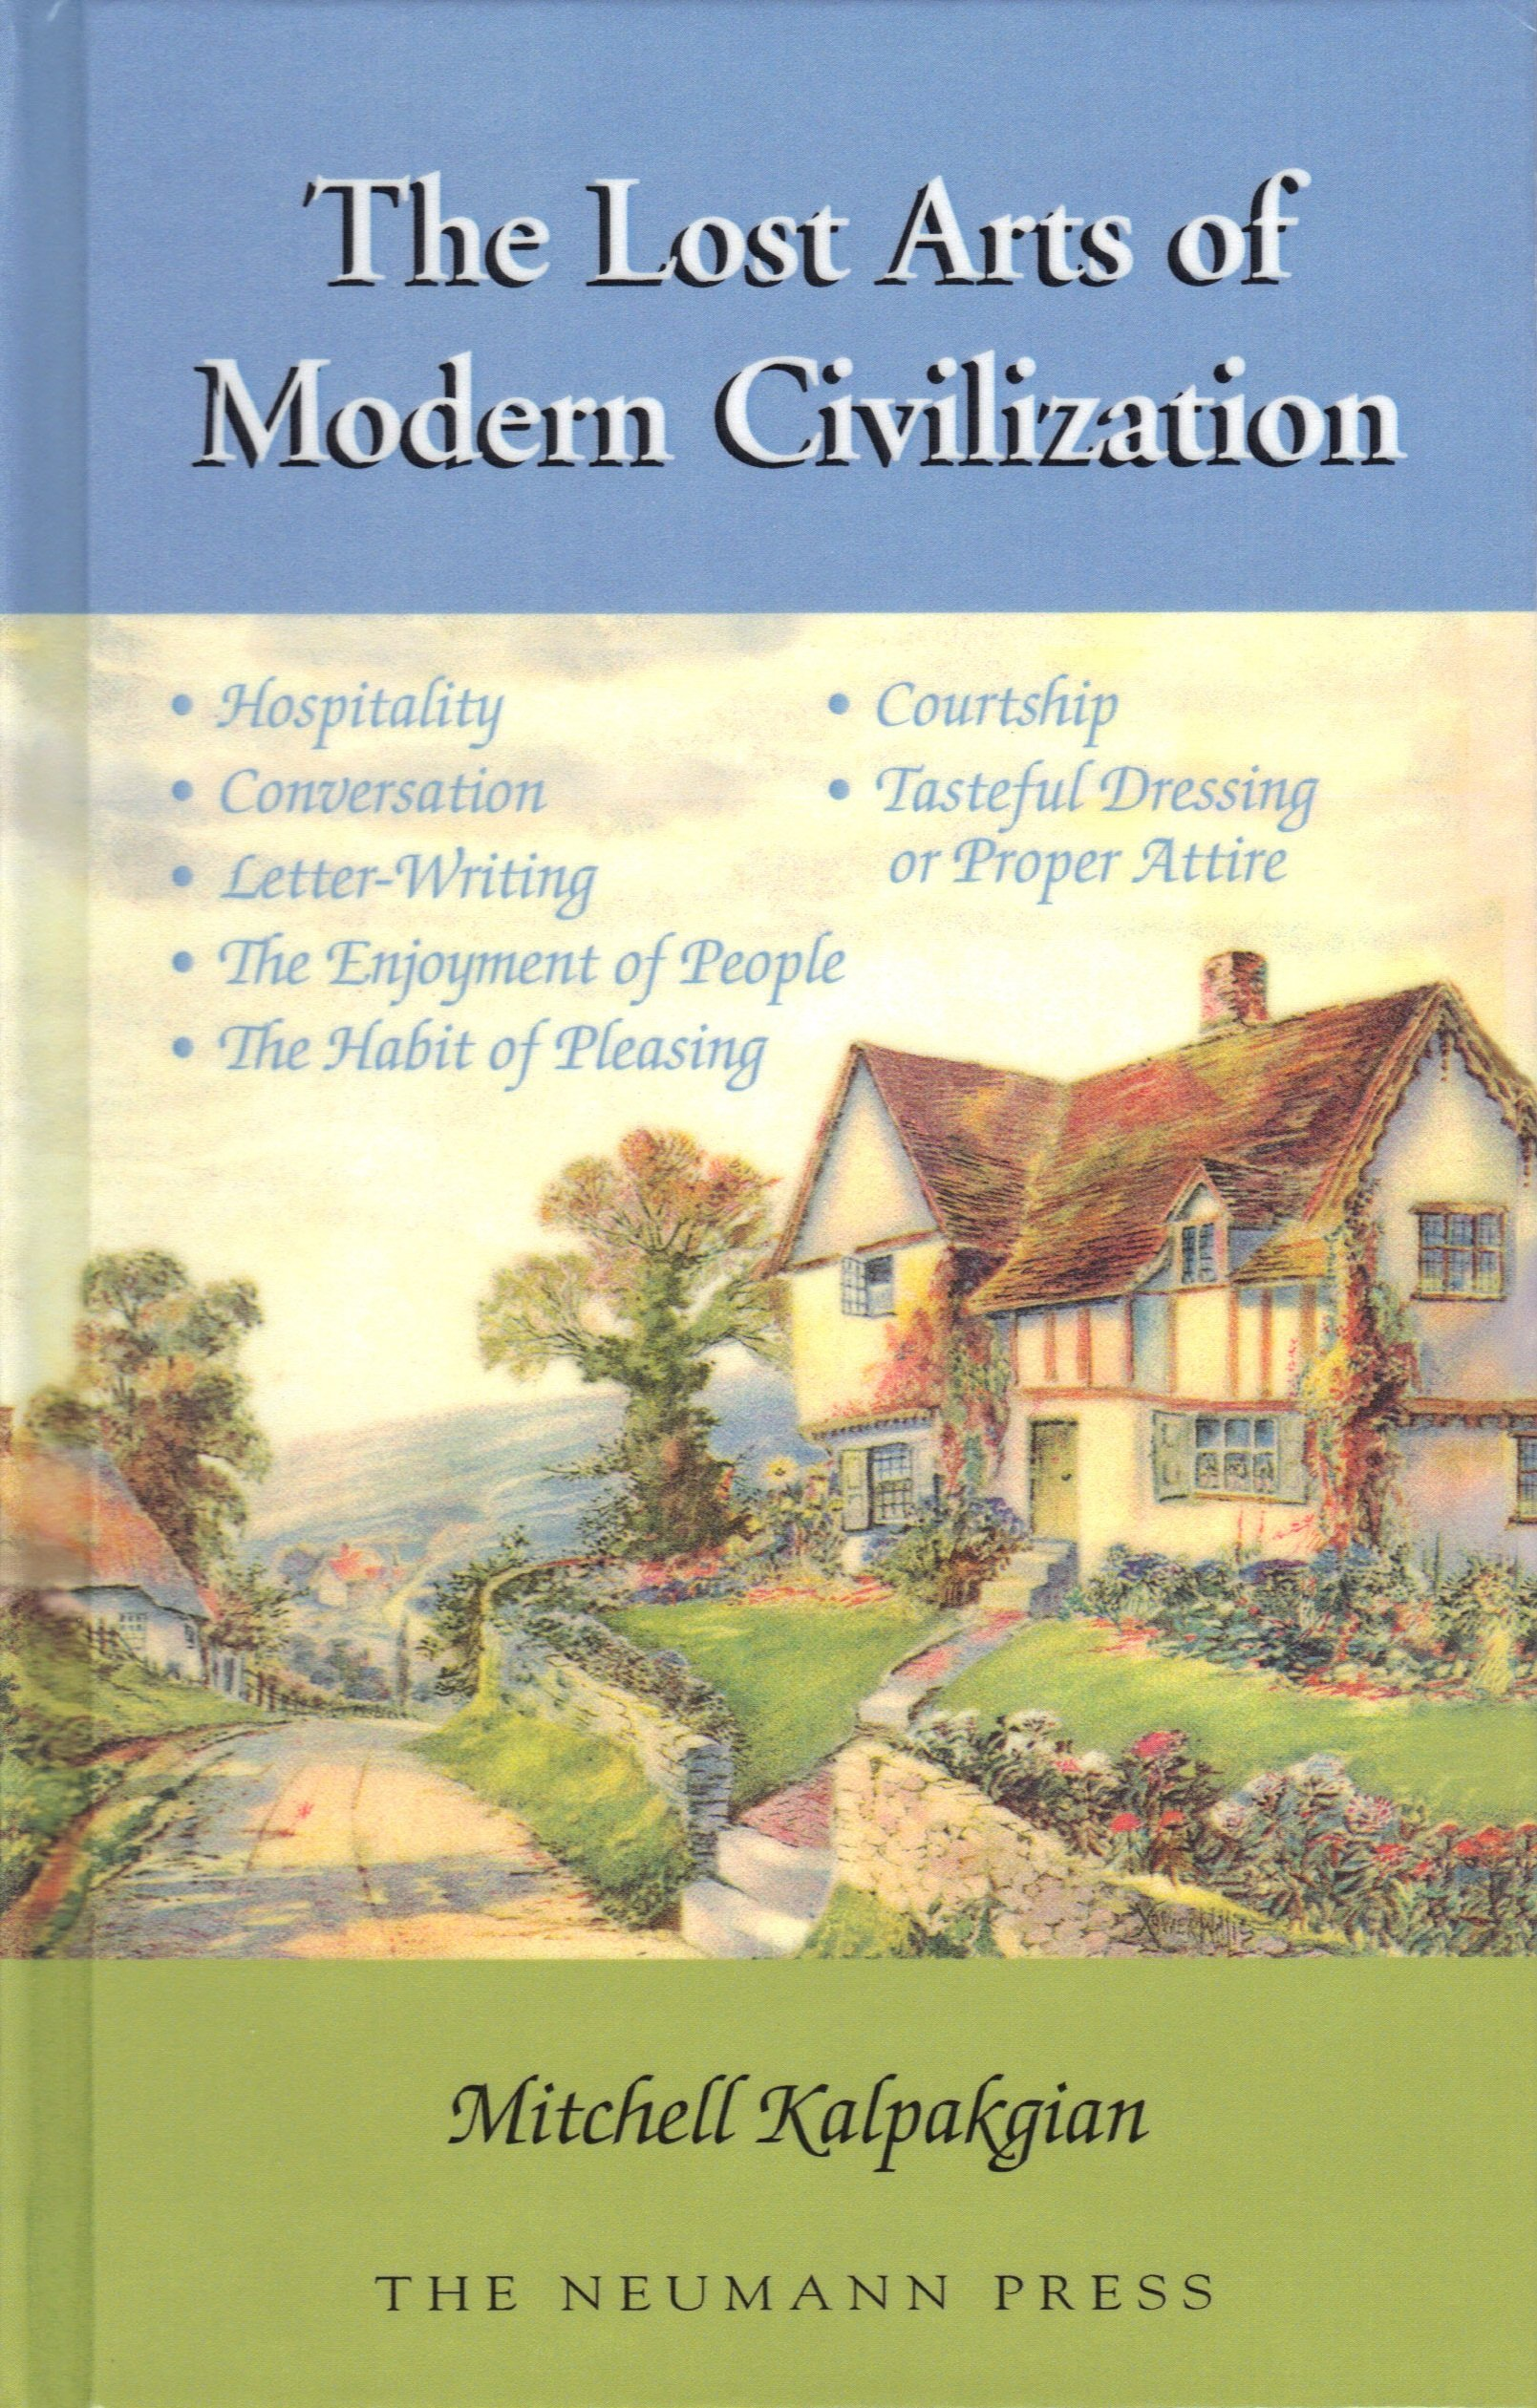 The Lost Arts of Modern Civilization ebook